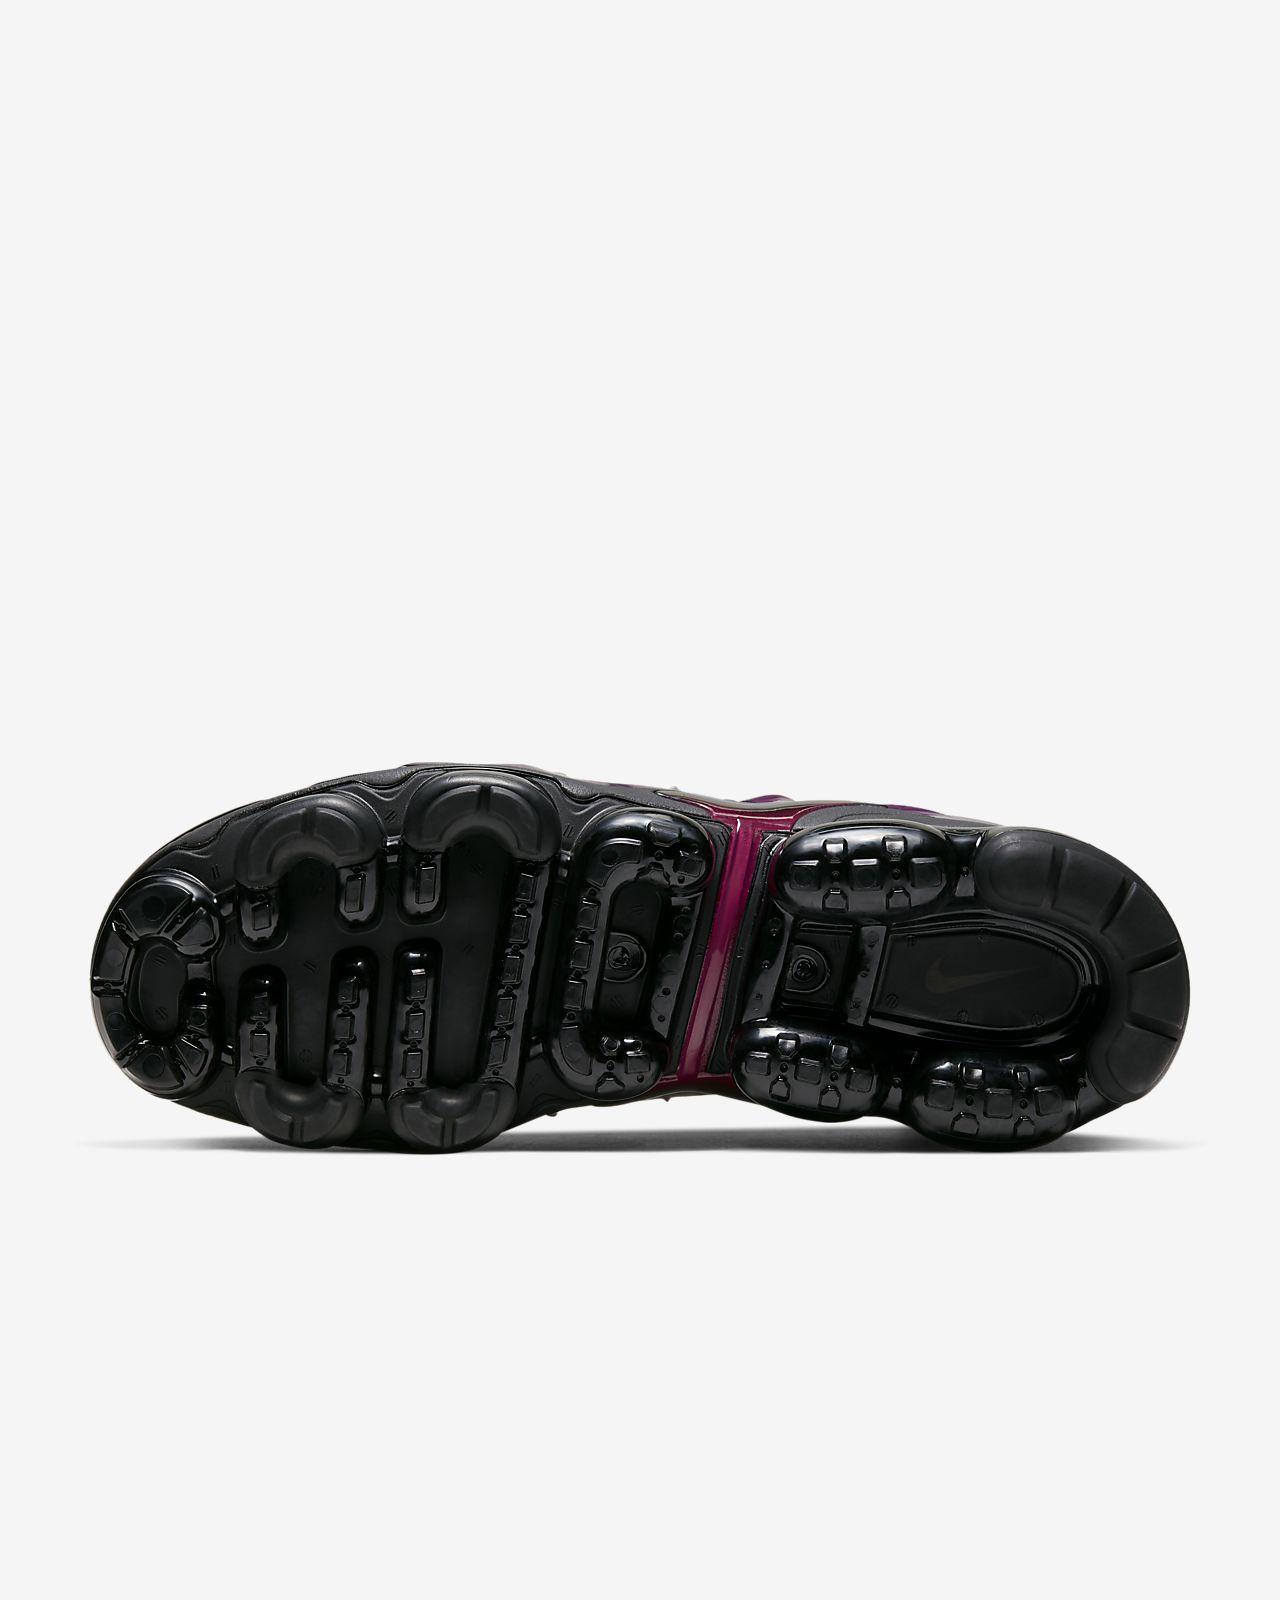 Nike Vapormax Plus Shoes Exporter,Nike Vapormax Plus Shoes